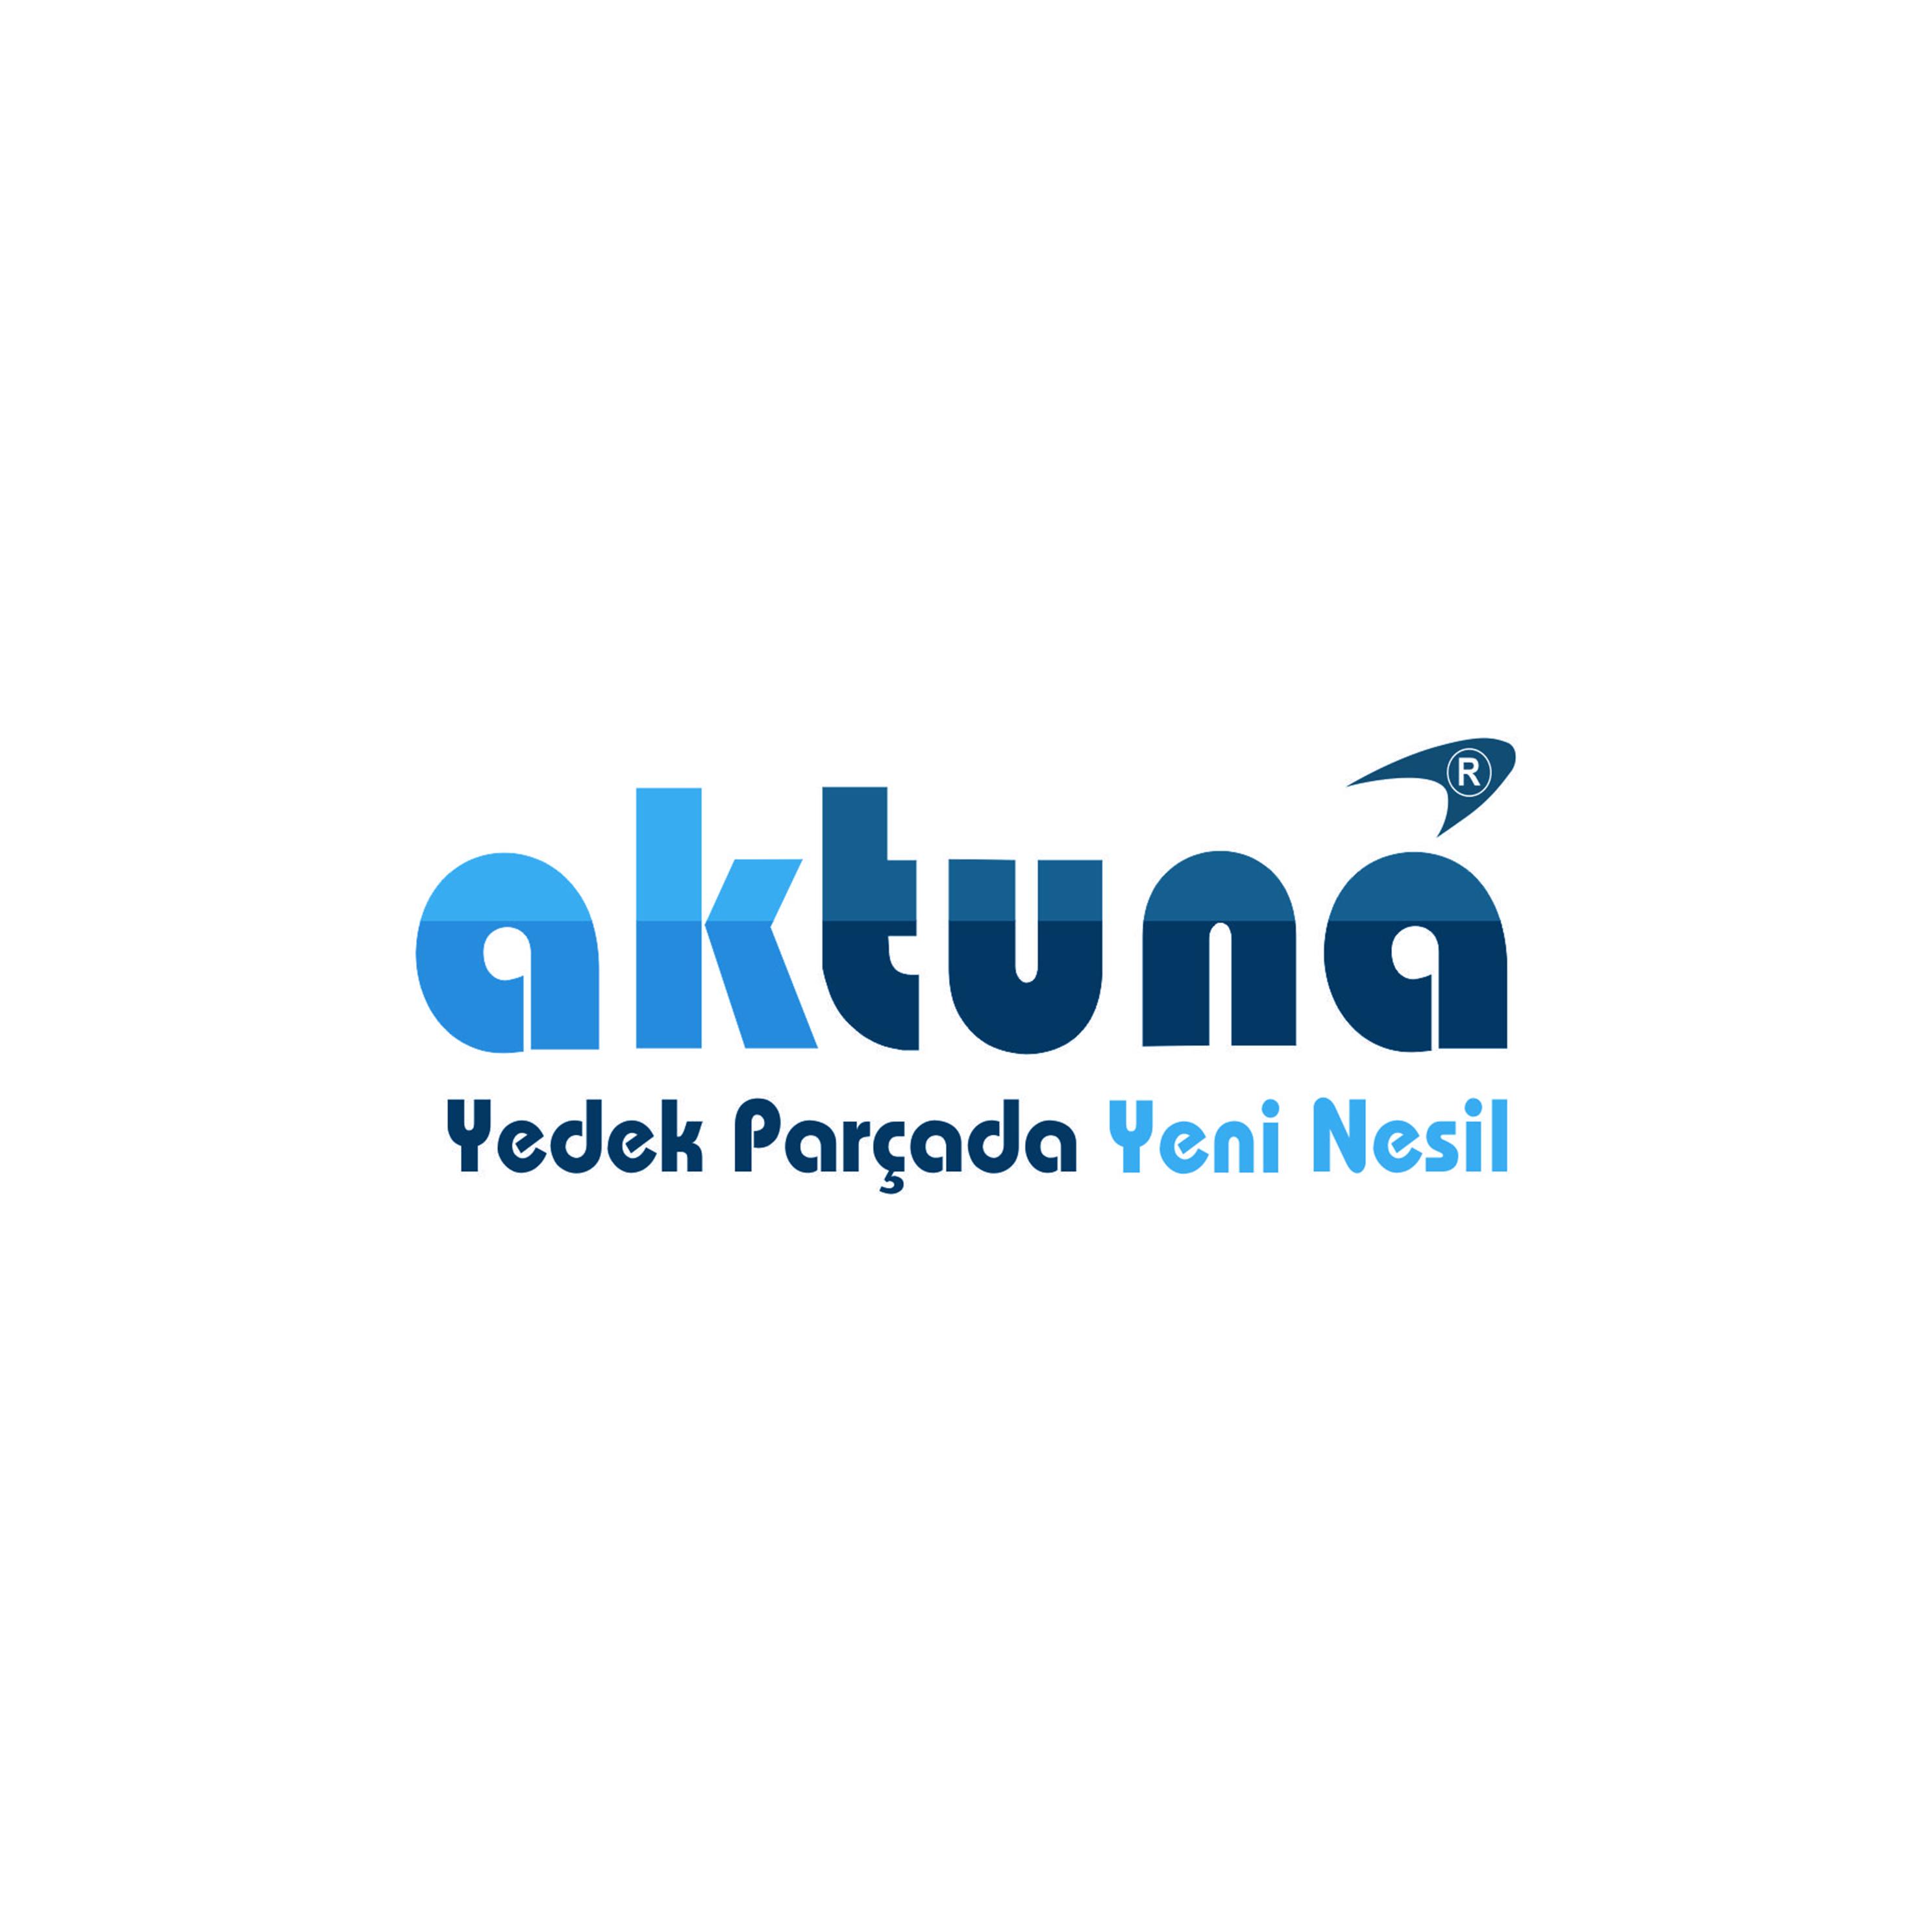 AK TUNA OTOMOTİV SAN. VE TİC. LTD. ŞTİ.